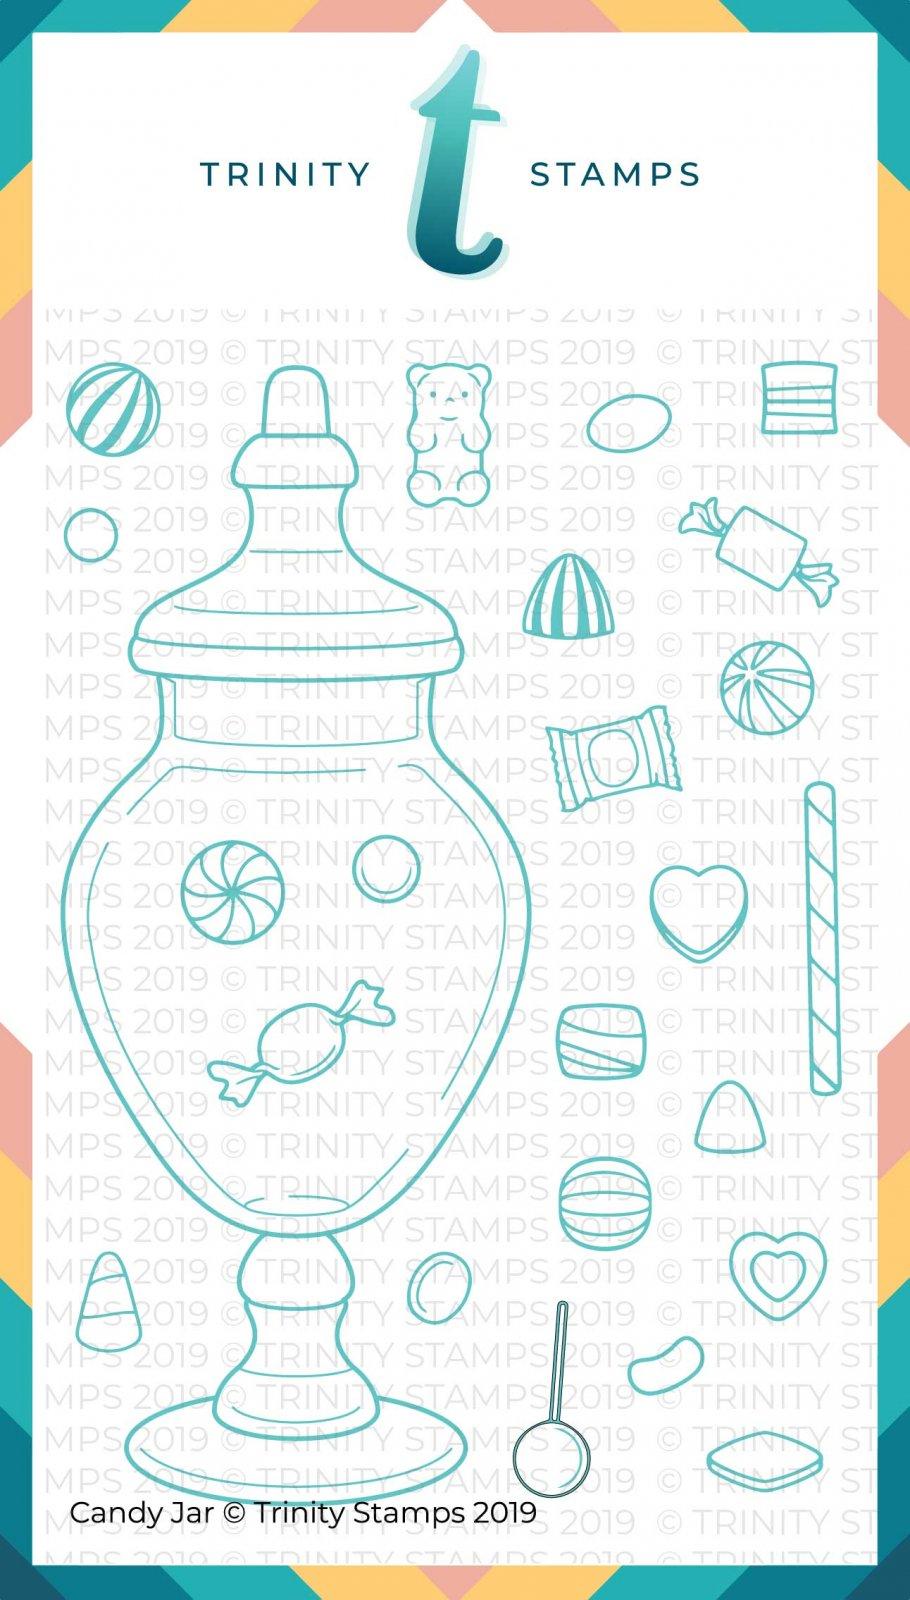 Trinity Stamps Candy Jar